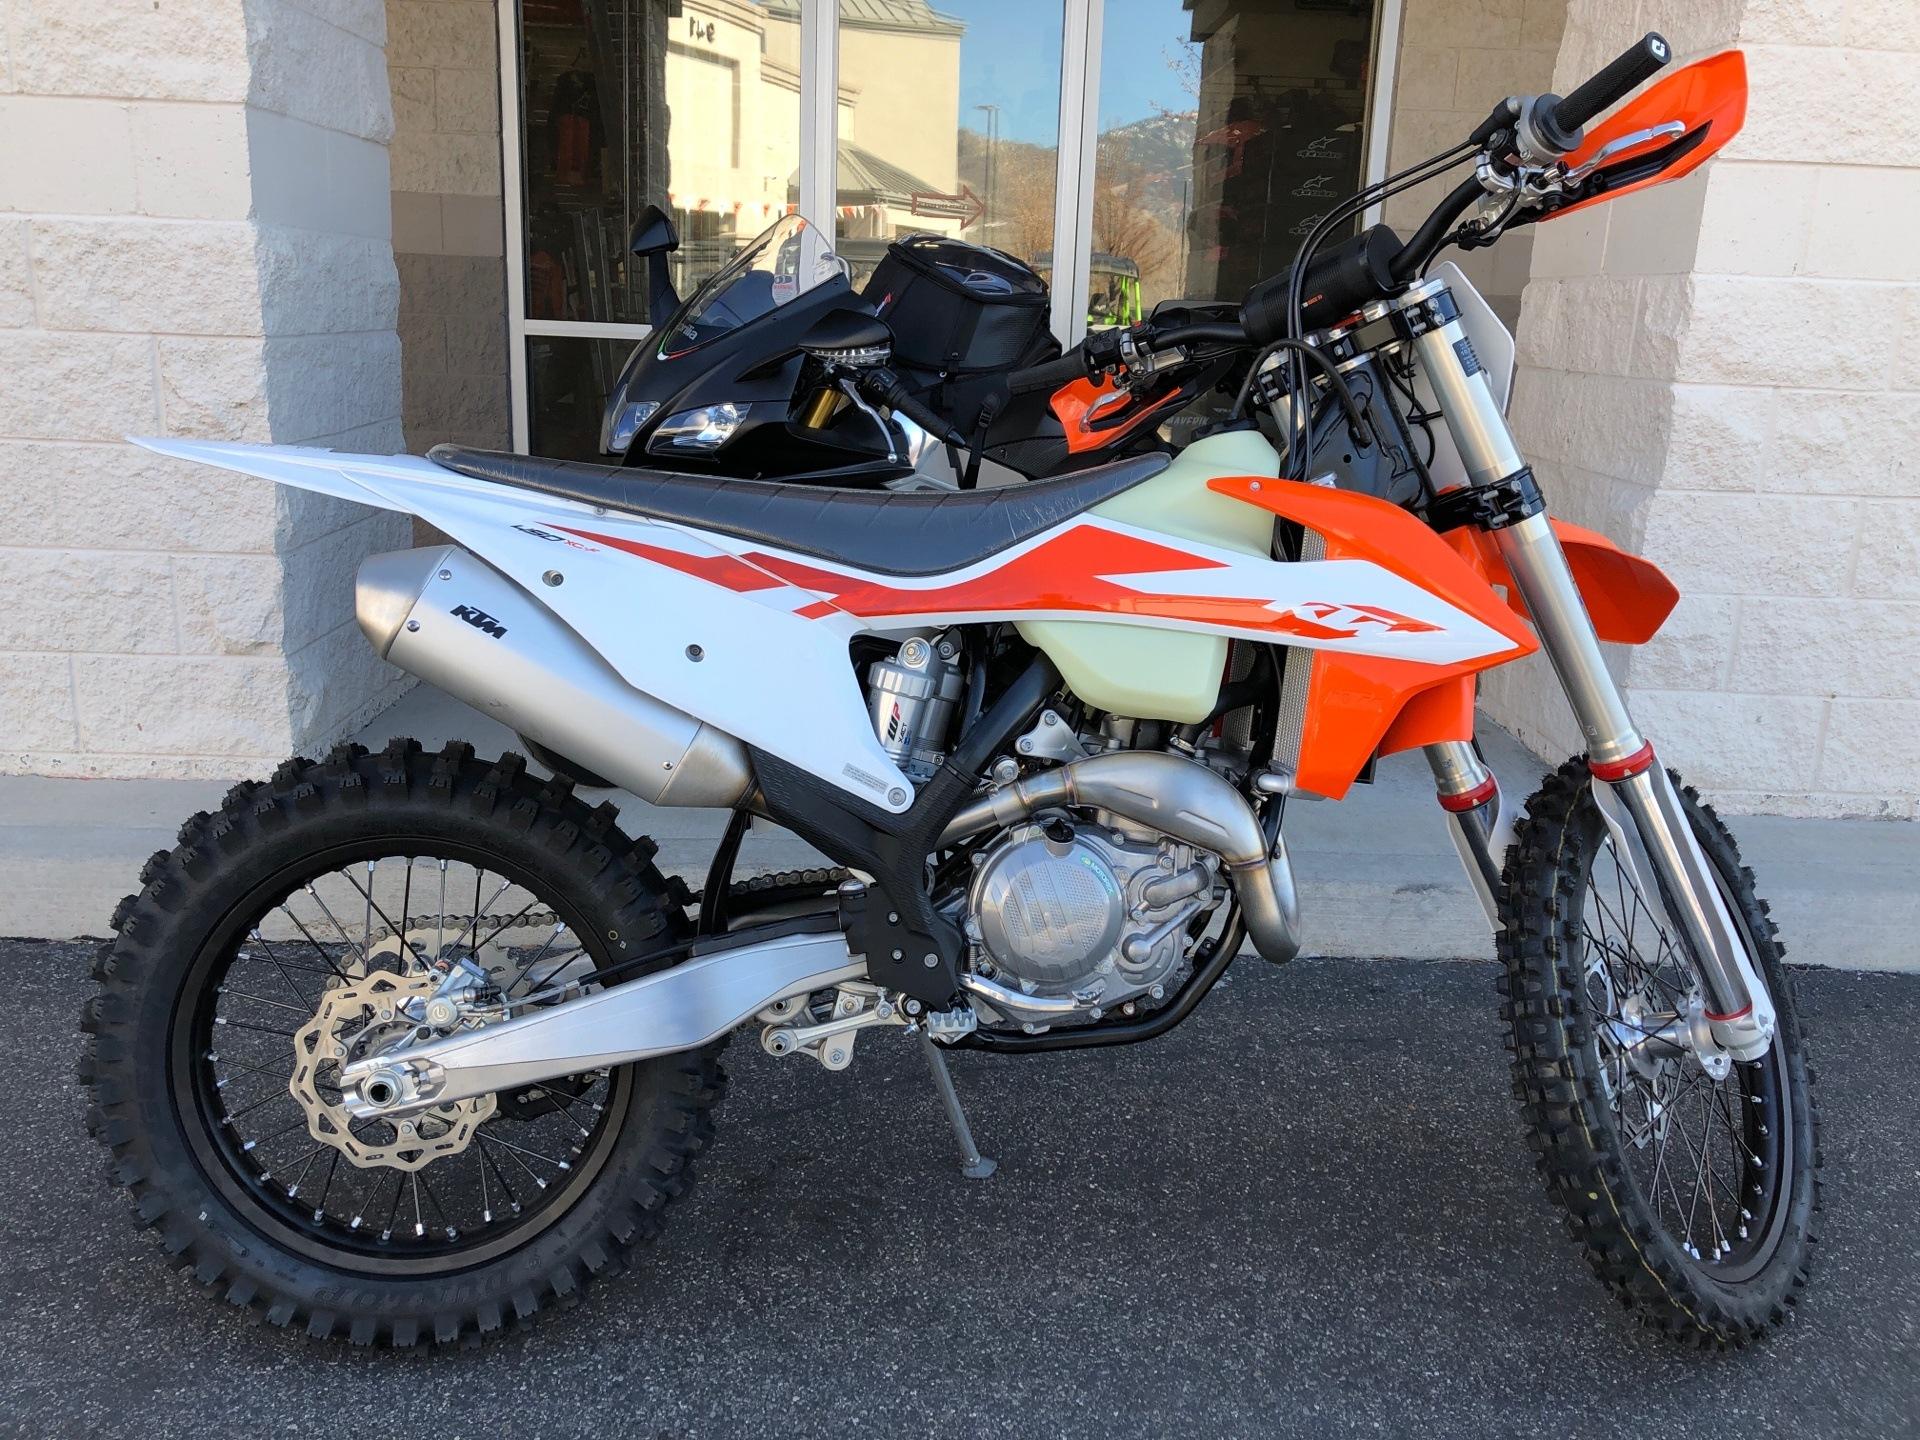 New 2020 KTM 450 XC-F | Motorcycles in Laredo TX | Orange